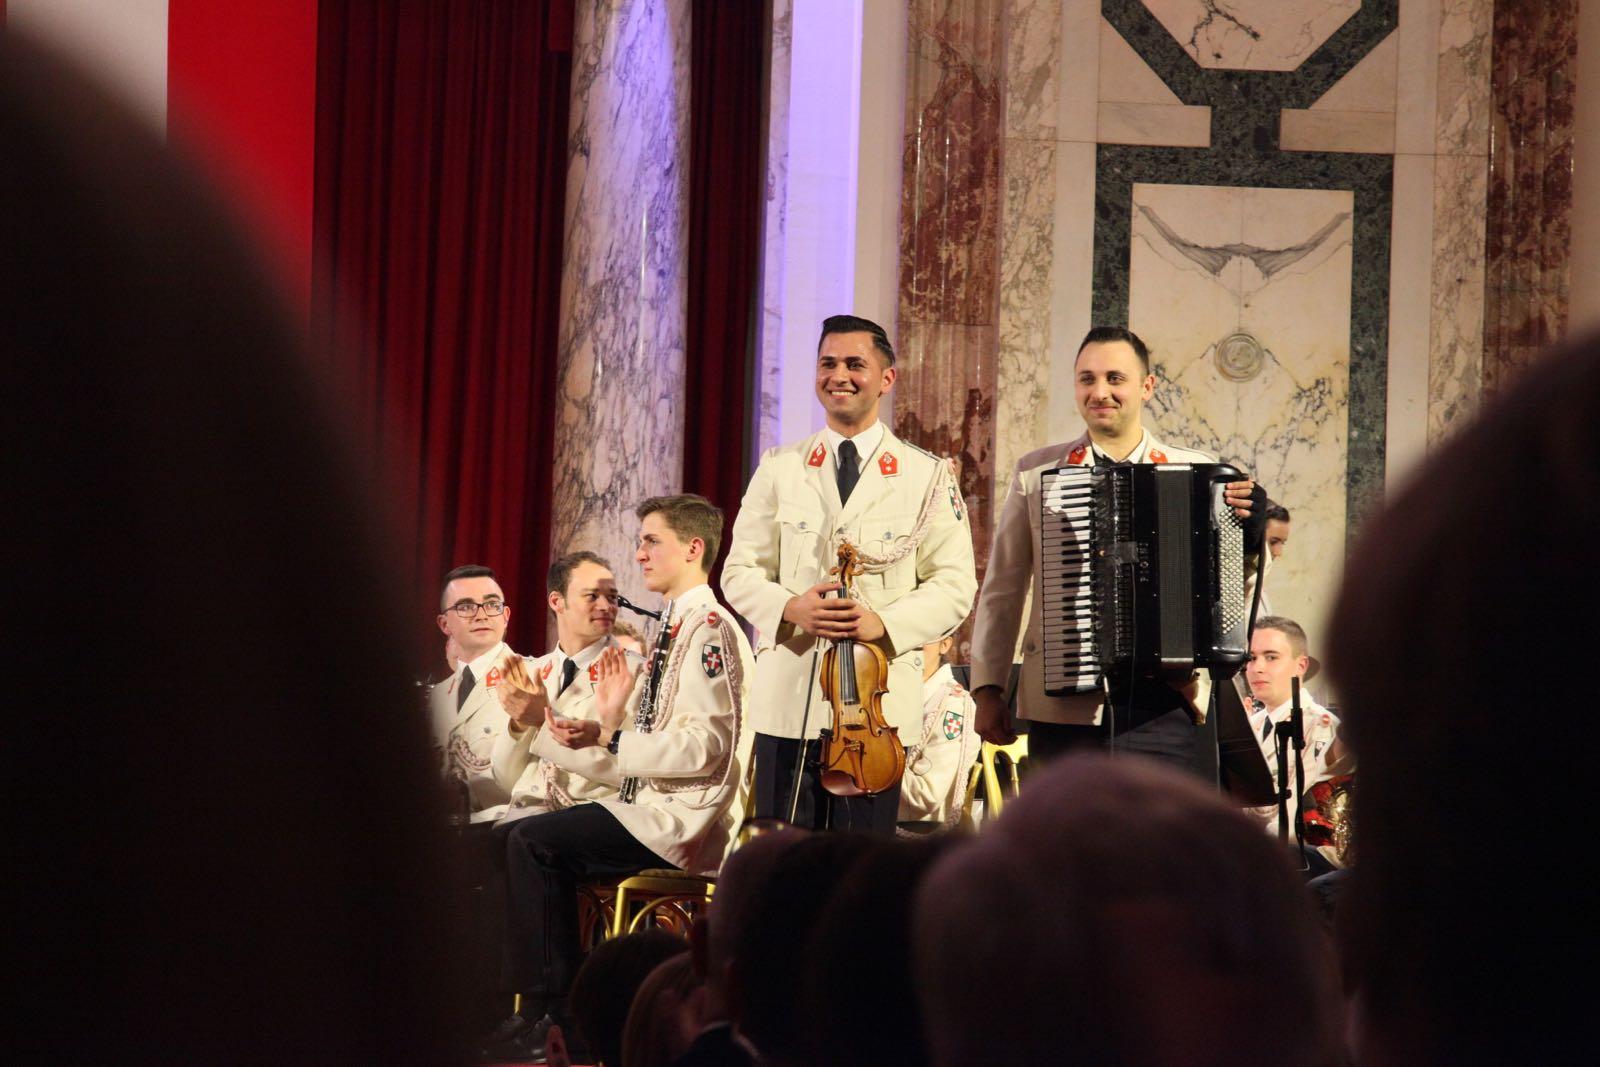 2019_03_14Gardemusik_Frühjahrskonzert_HBP_Hofburg - 105 of 177